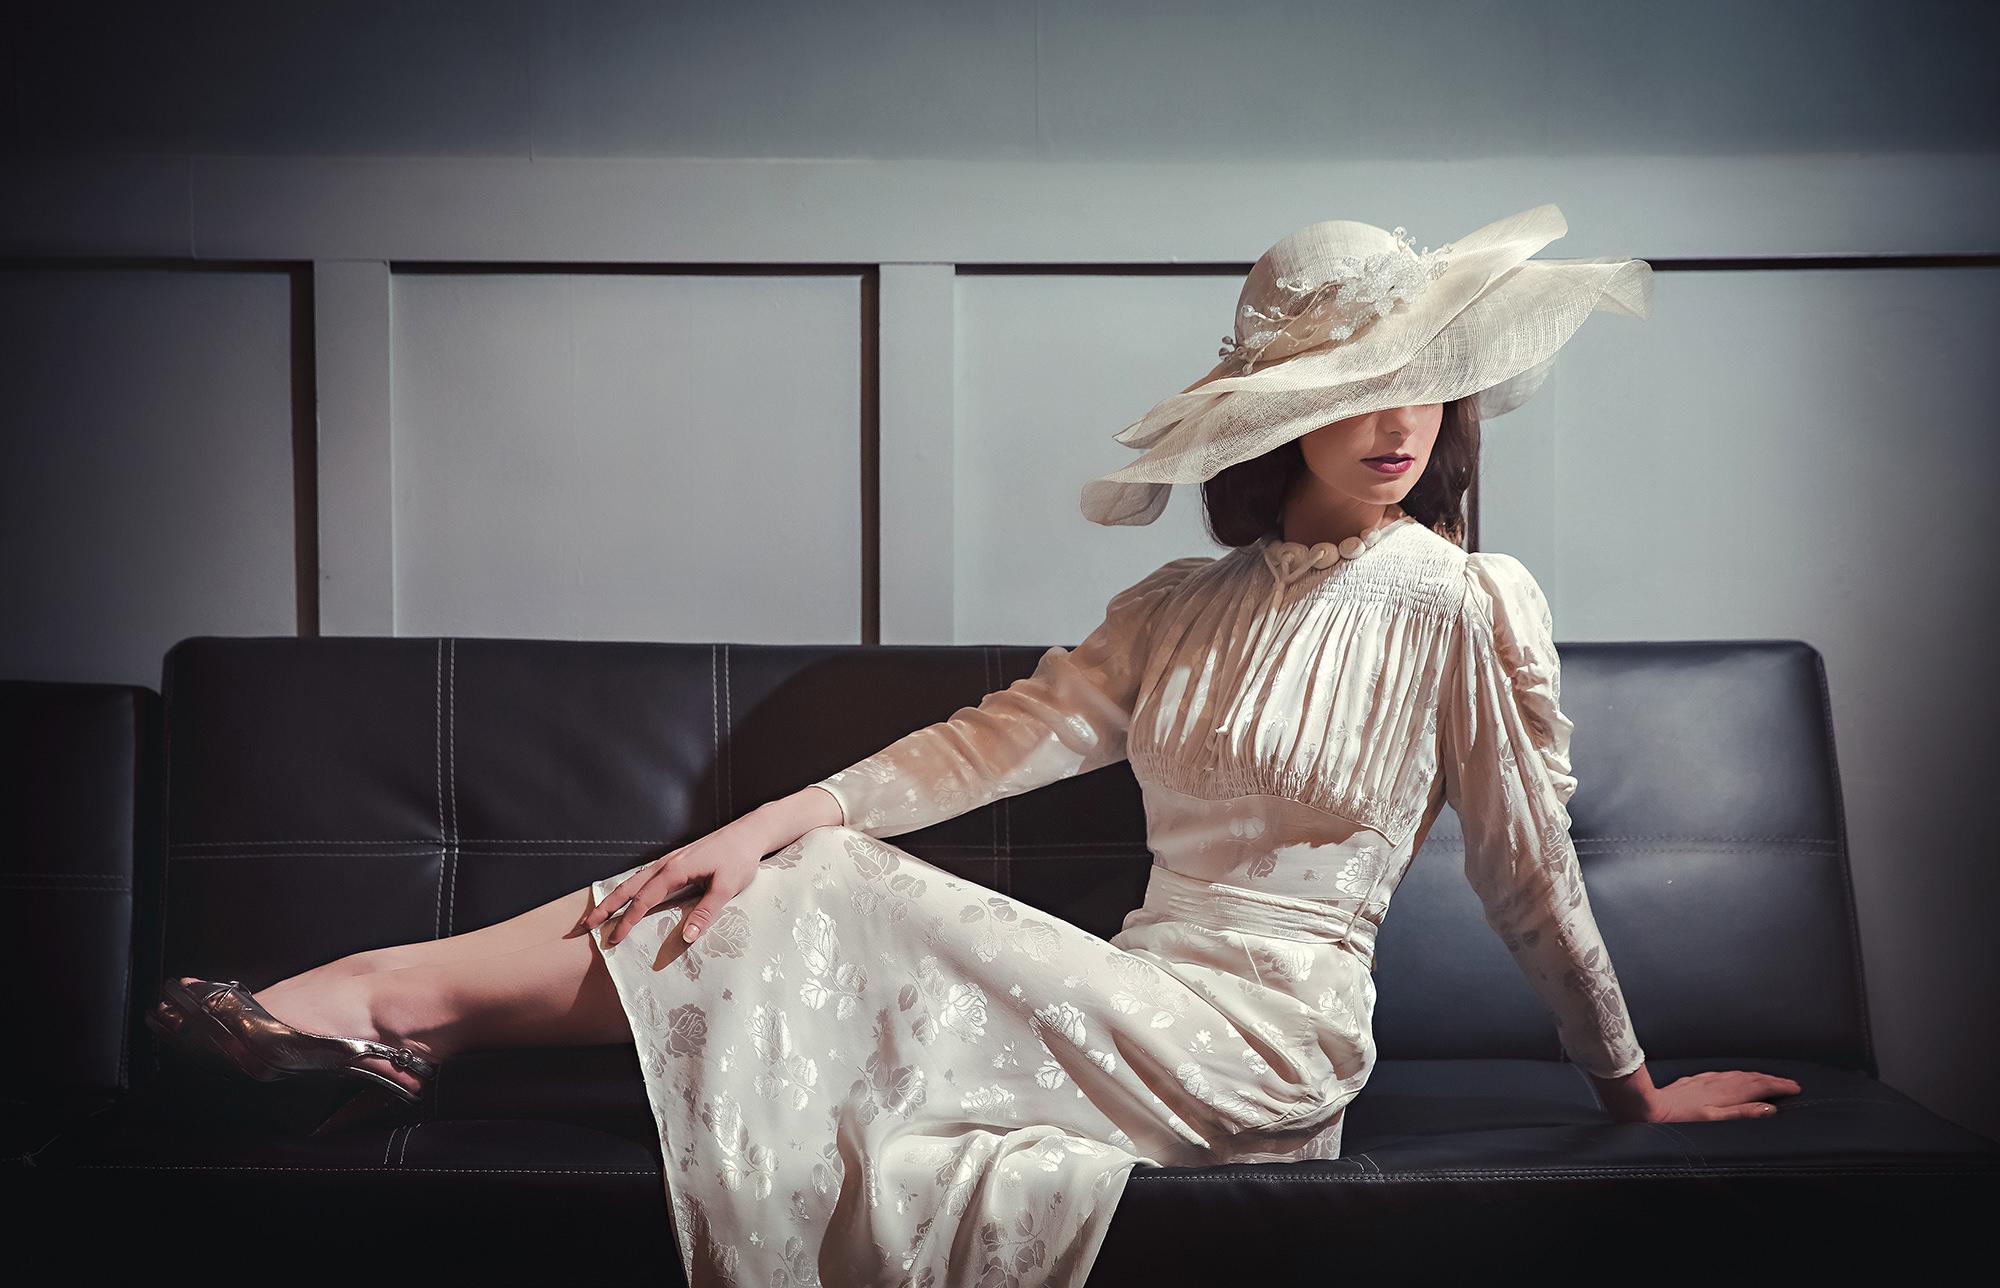 Vintage Wedding Dresses Hampshire: Even More Dreamy Vintage Wedding Dresses…